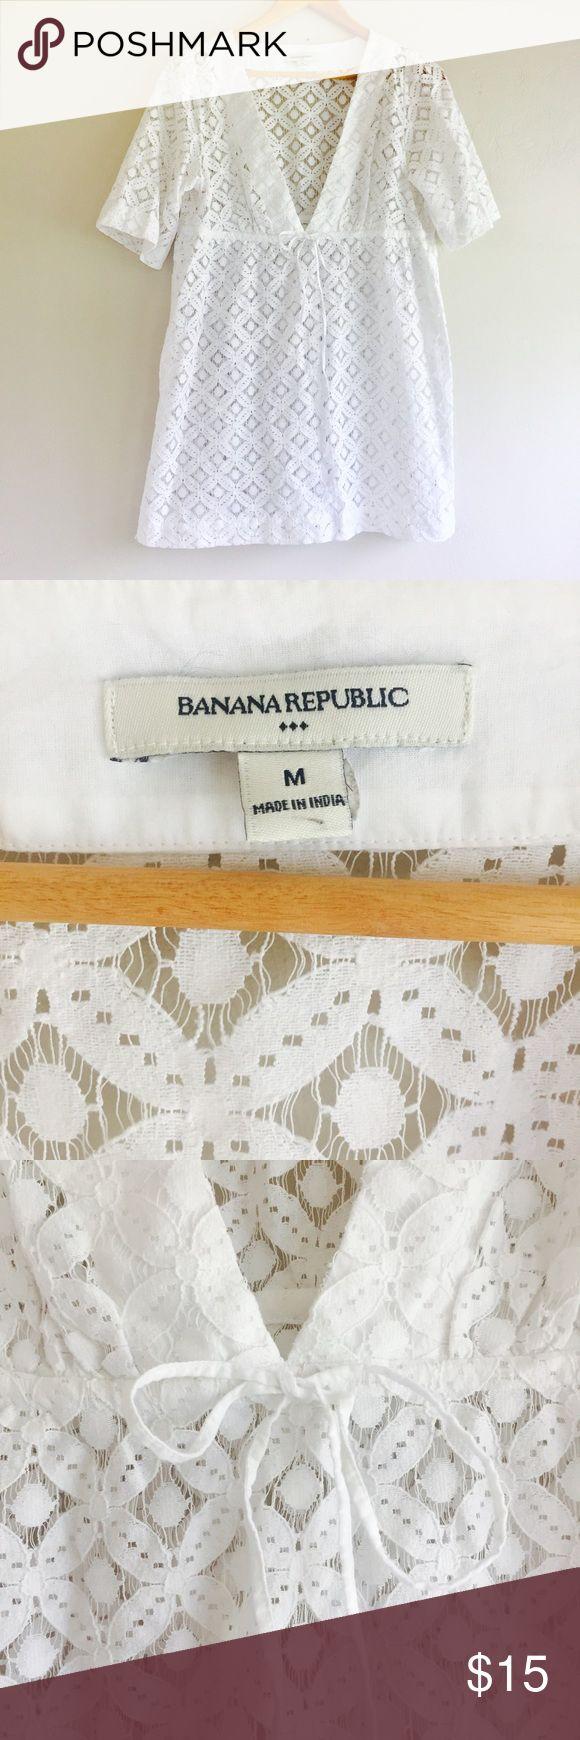 BANANA REPUBLIC White Crochet Swim Cover Up Dress BANANA REPUBLIC White V Neck Crochet Swim Cover Up Dress Tunic  Medium M Cotton, polyester blend Preowned good condition Banana Republic Swim Coverups